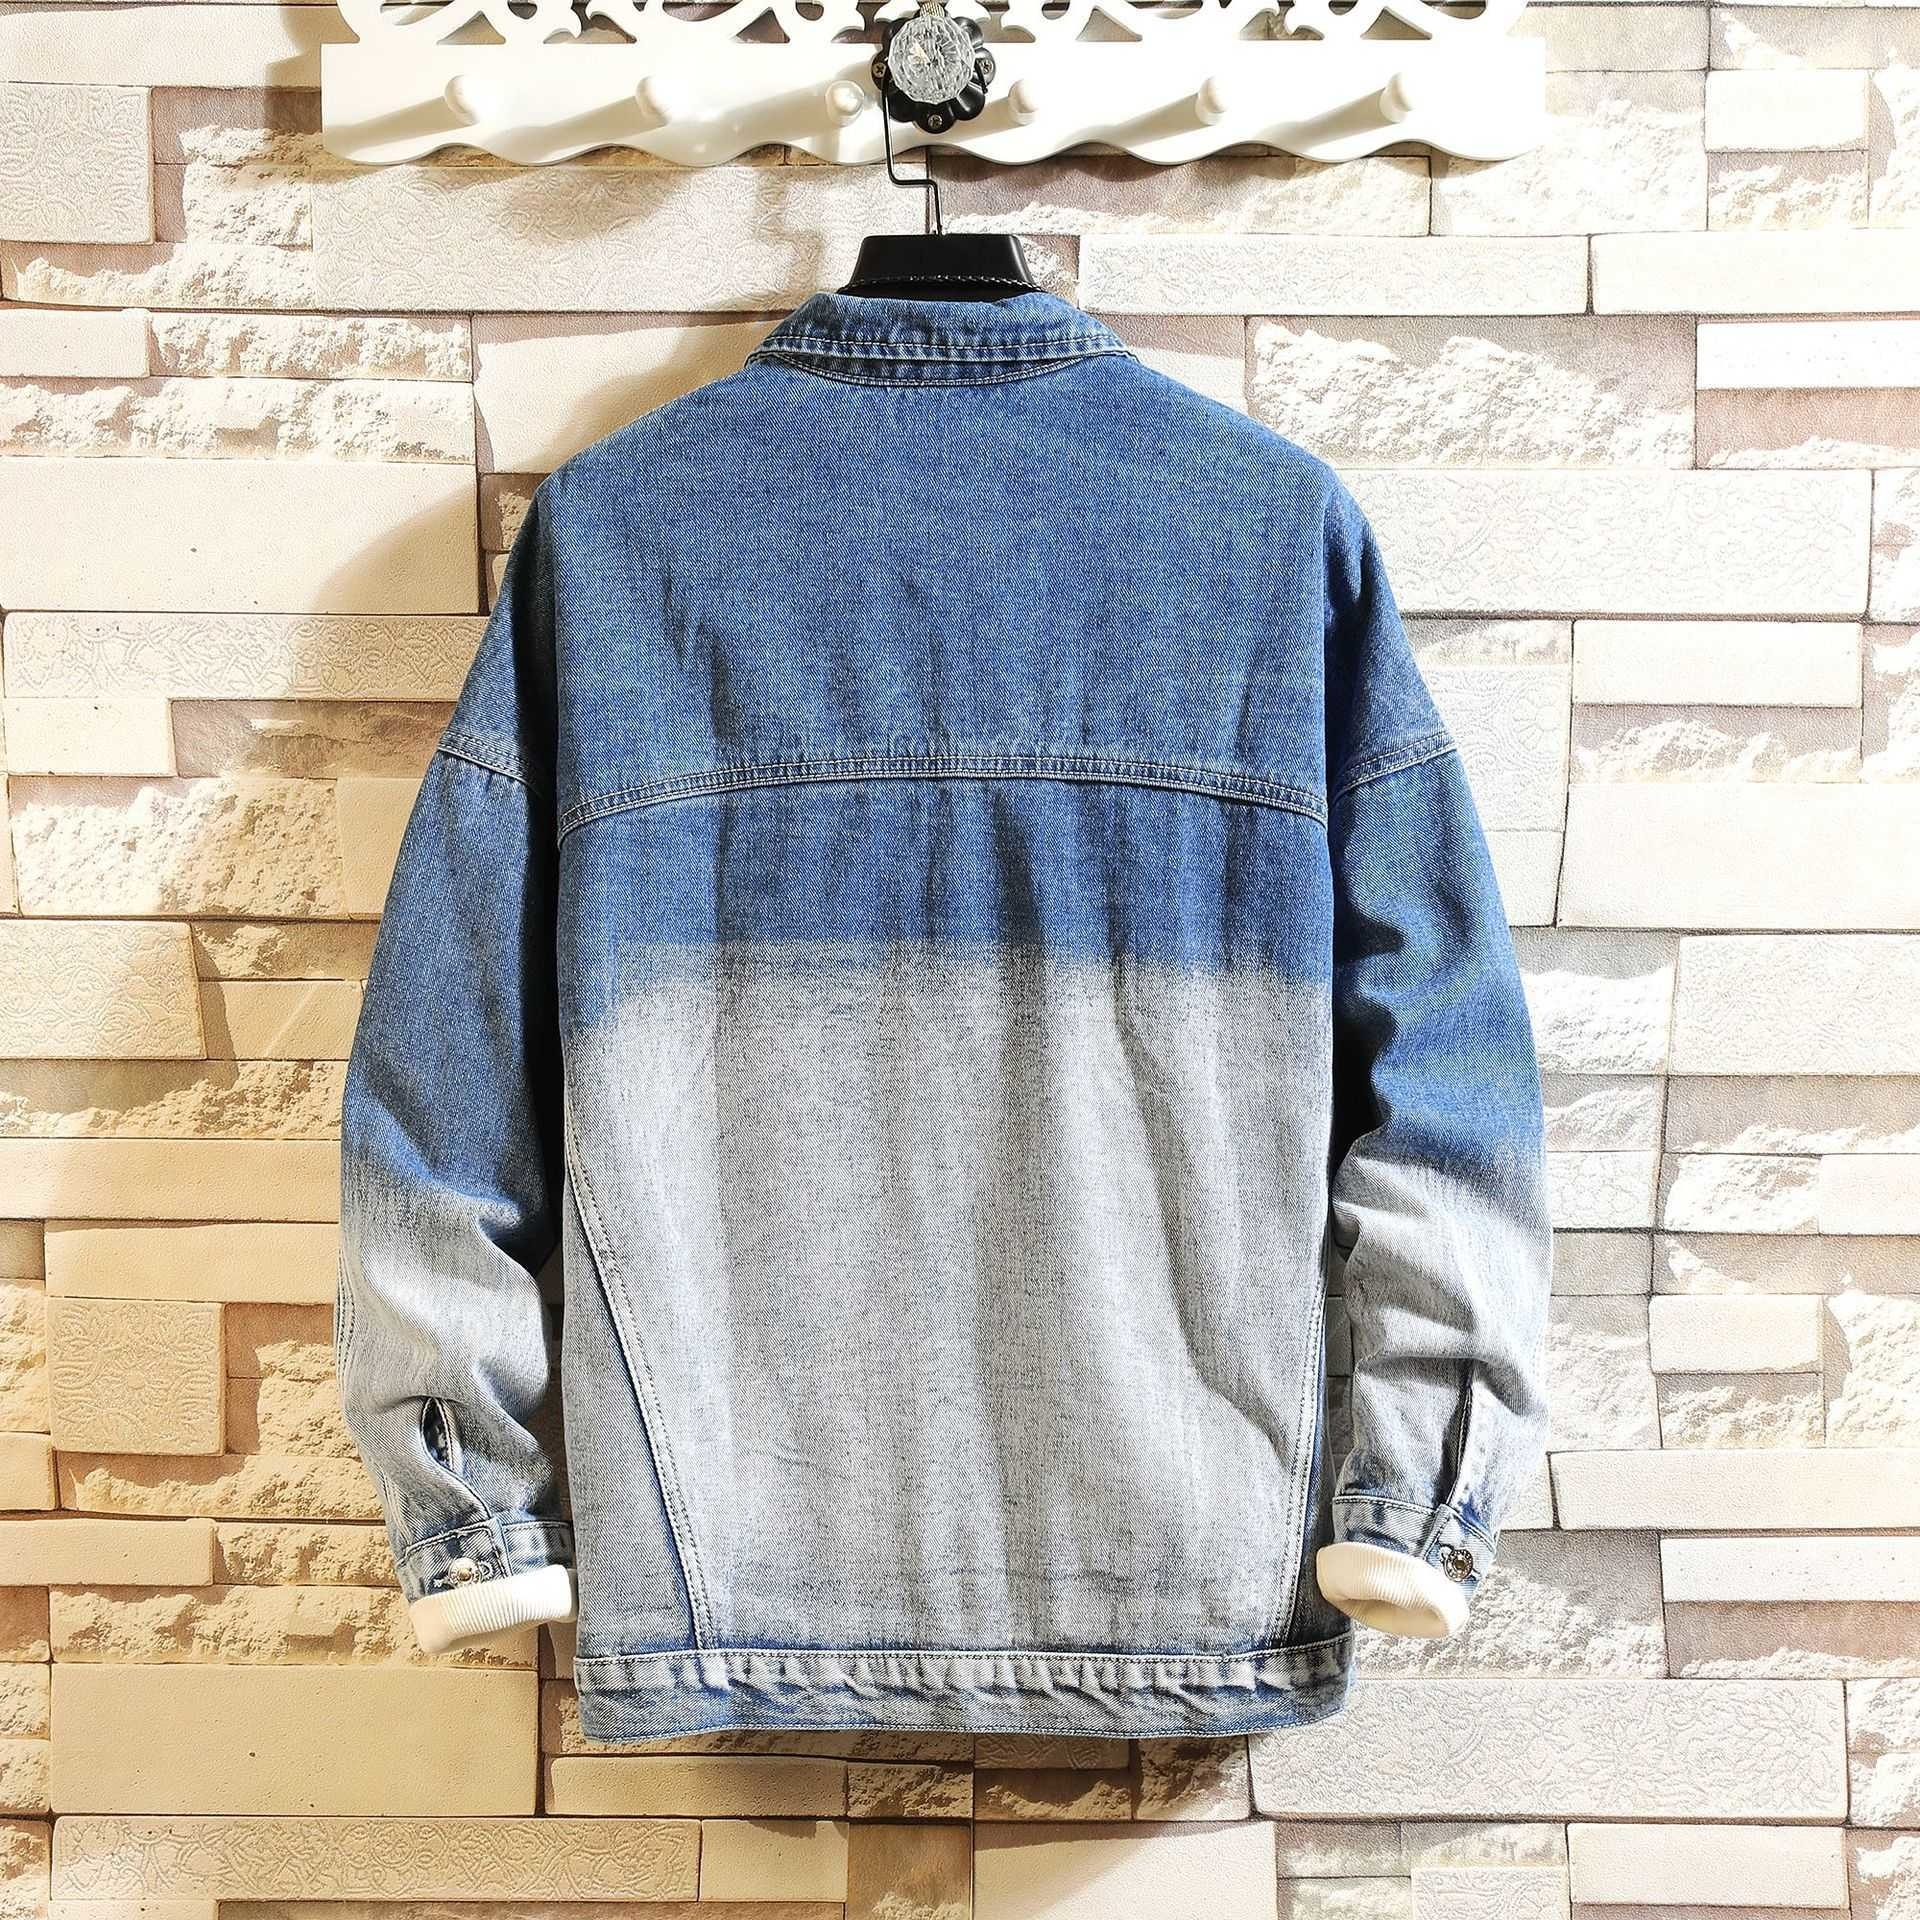 Jeans Herren Jacke Kontrastfarbe Paarabnutzung Herren Damen Hoodies Jeans Jacken Schlanke lässige Hoodies Streetwear Vintage Jean Jacken